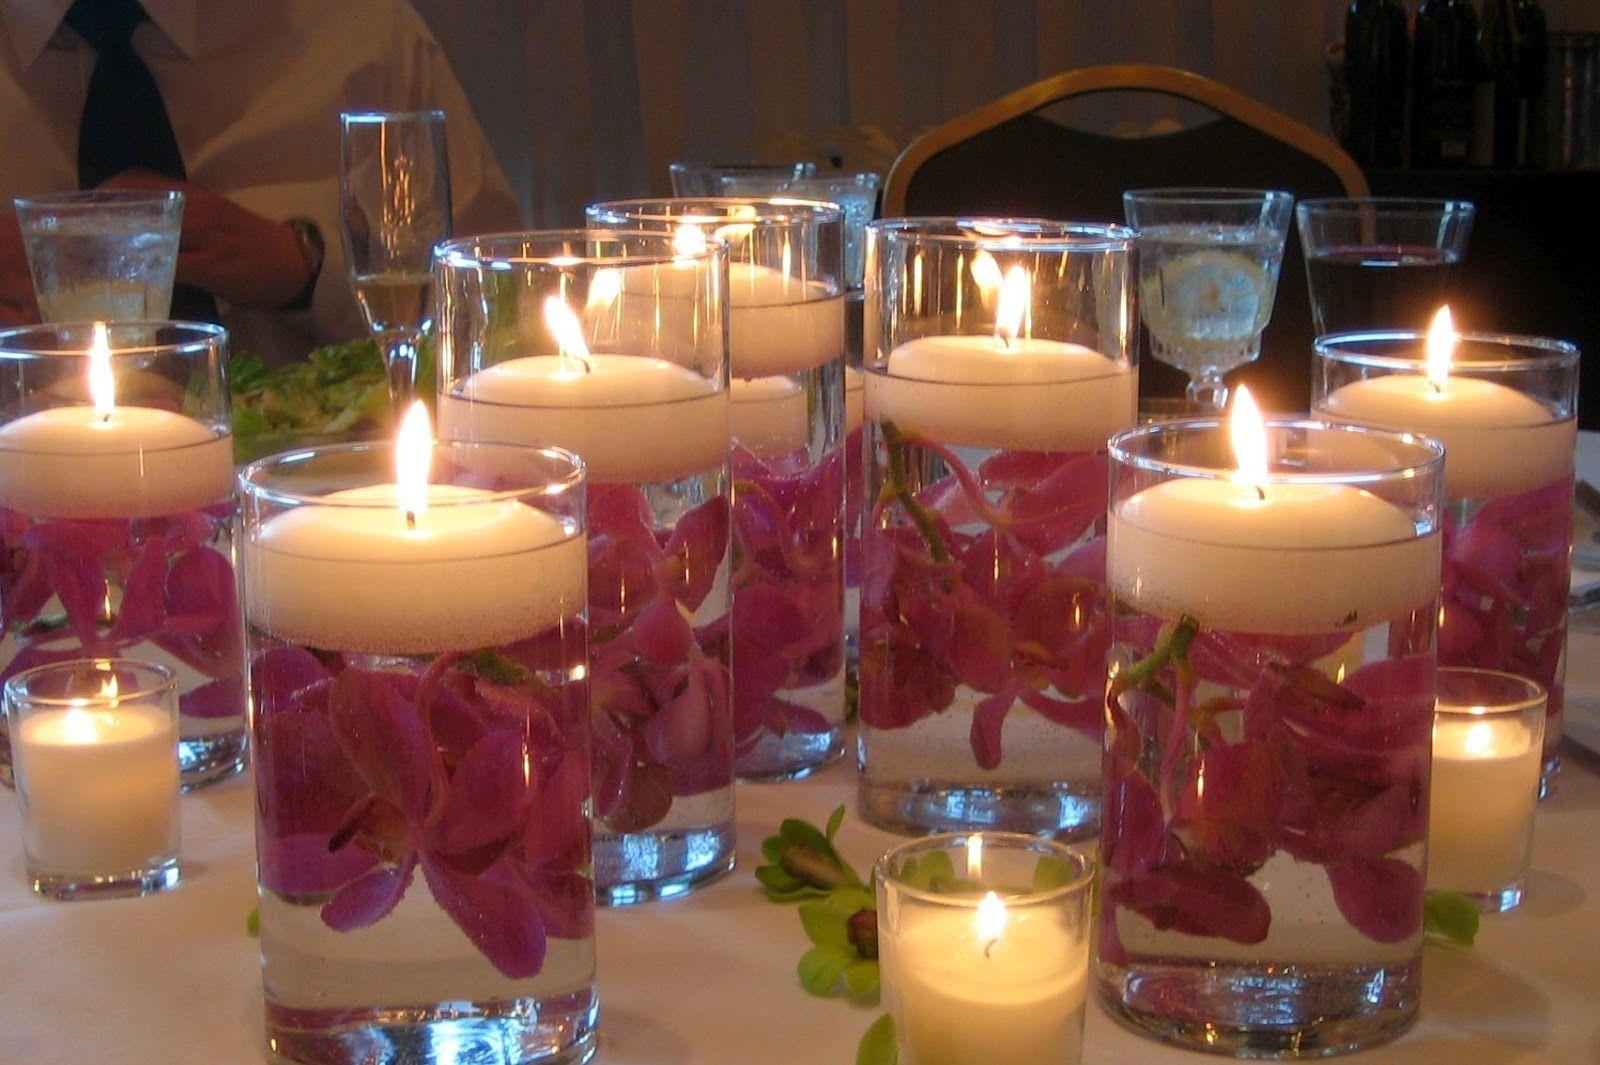 Wedding Table Centerpieces Ideas Dansrant Com Floating Candle Centerpieces Candle Centerpieces Wedding Reception Centerpieces